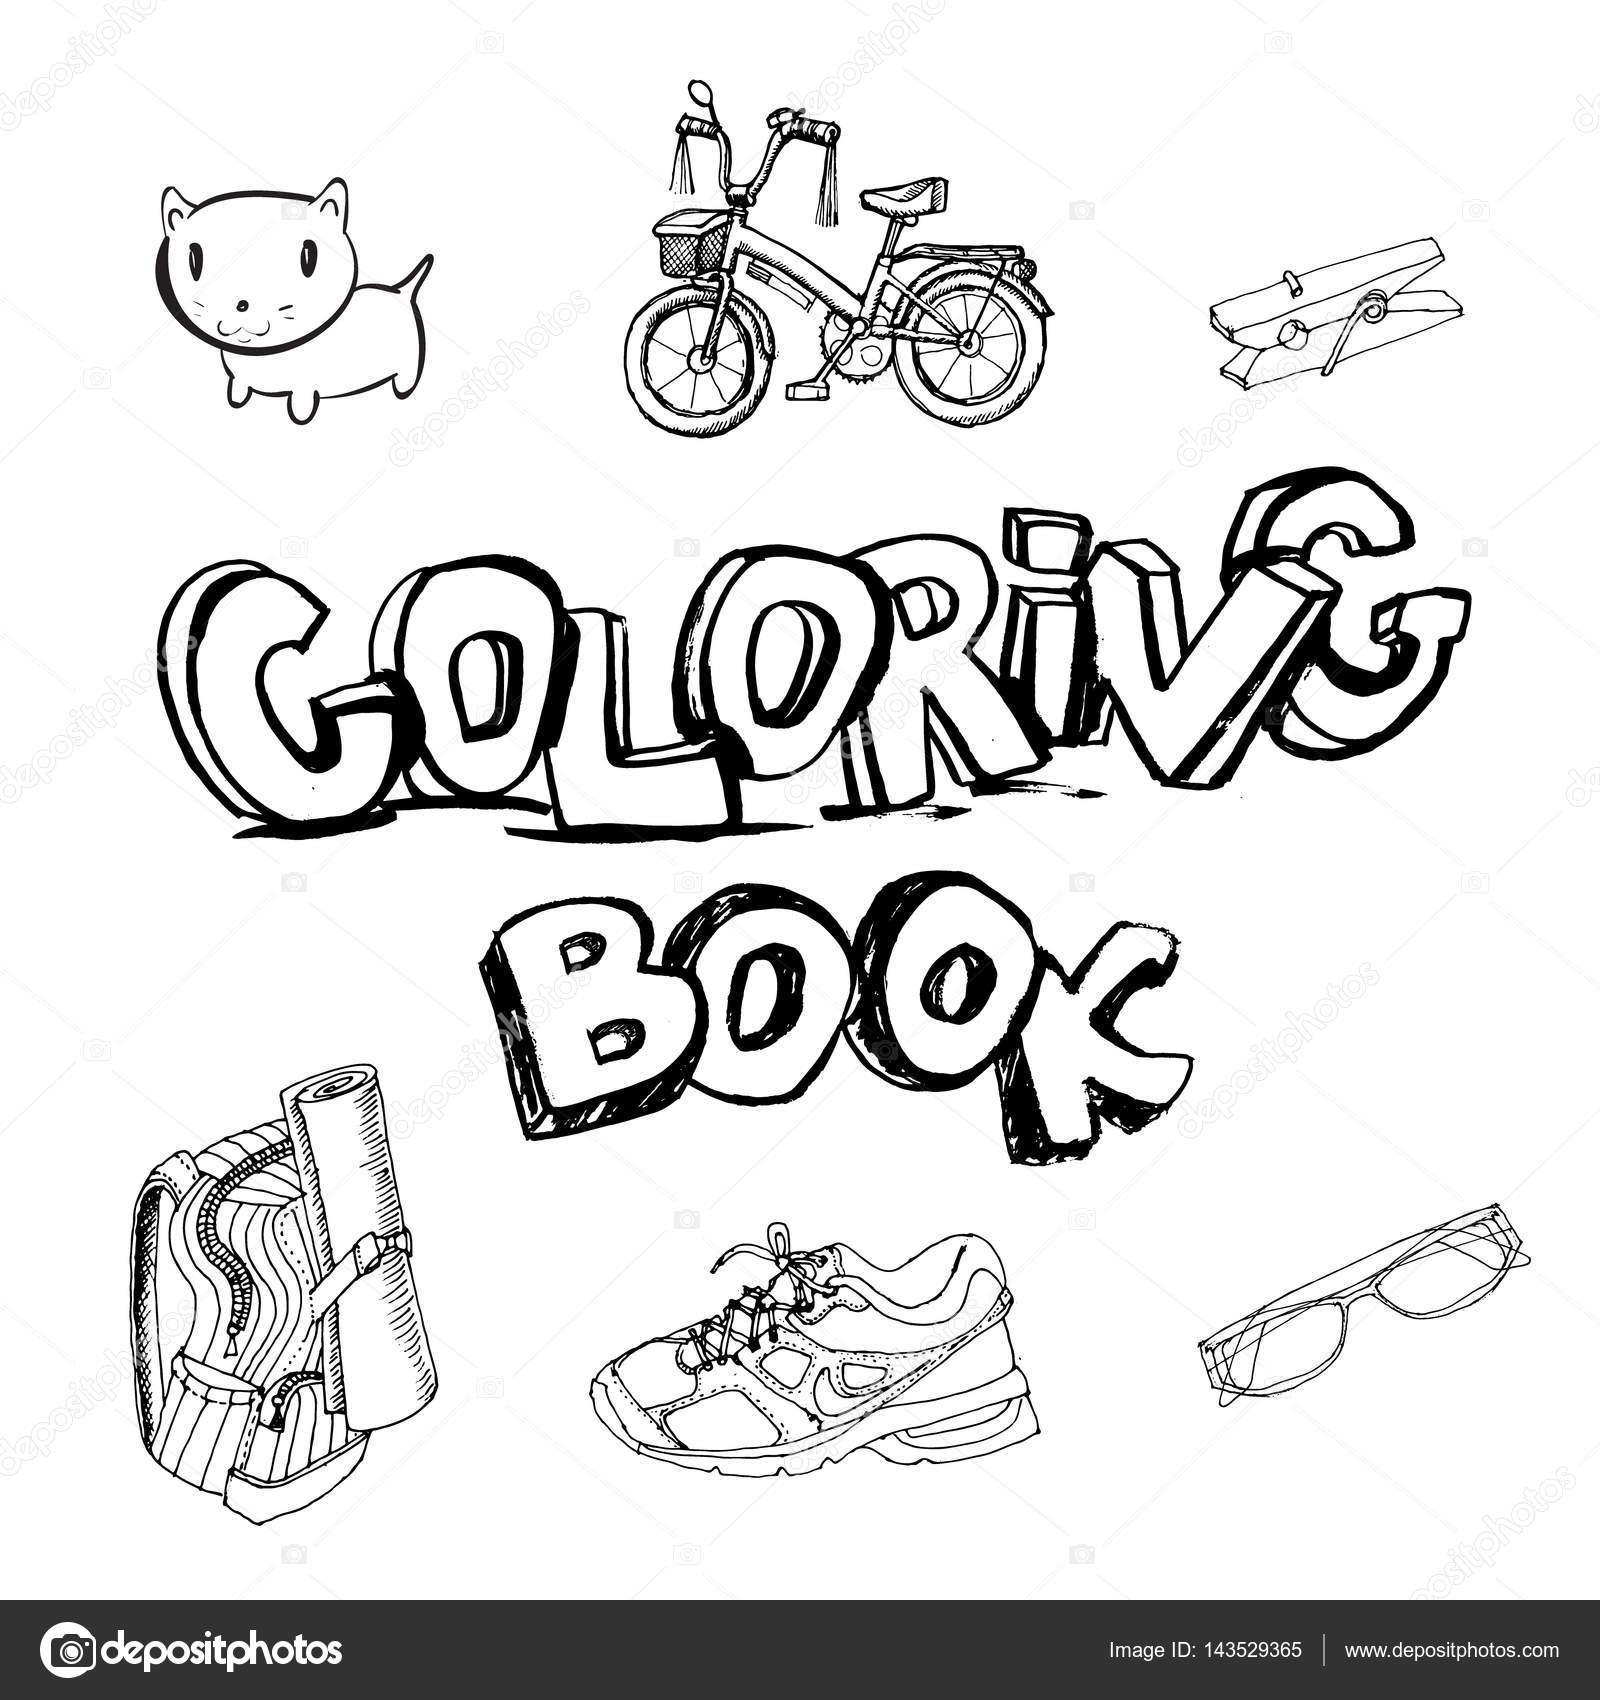 Fotos Letras Para Dibujar Libro Dibujo Vector De Letras Para